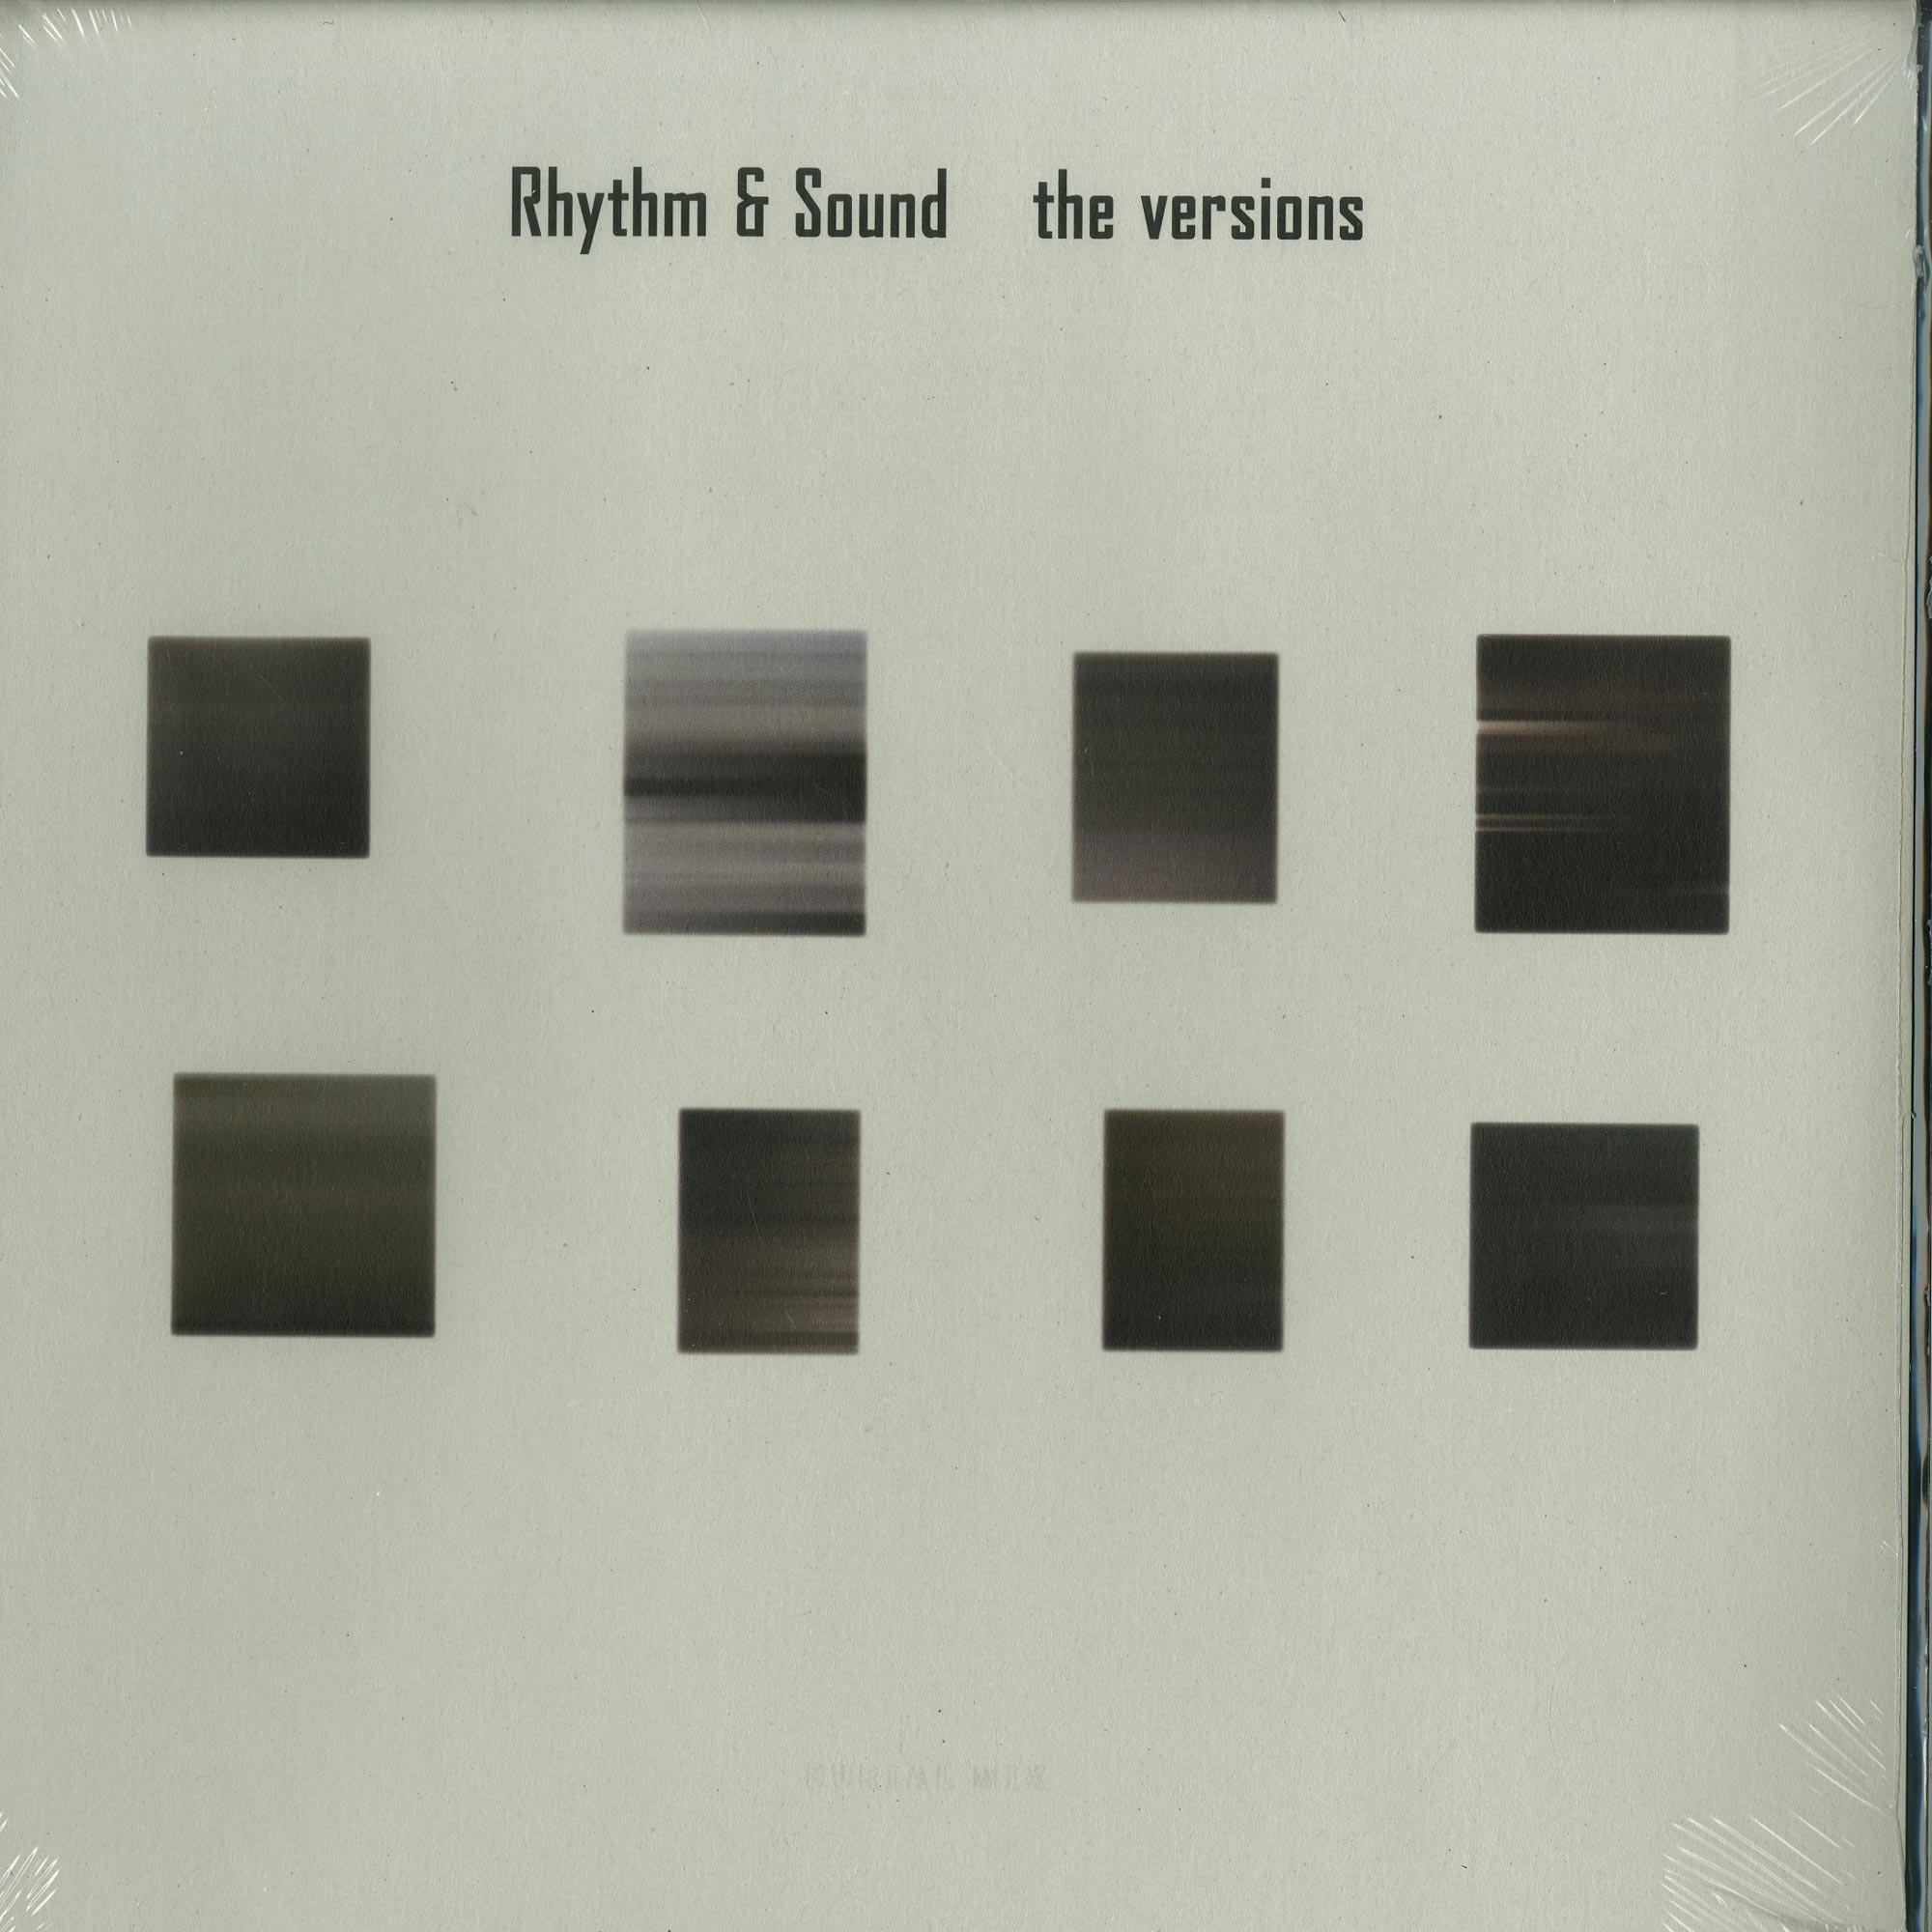 Rhythm & Sound - THE VERSIONS